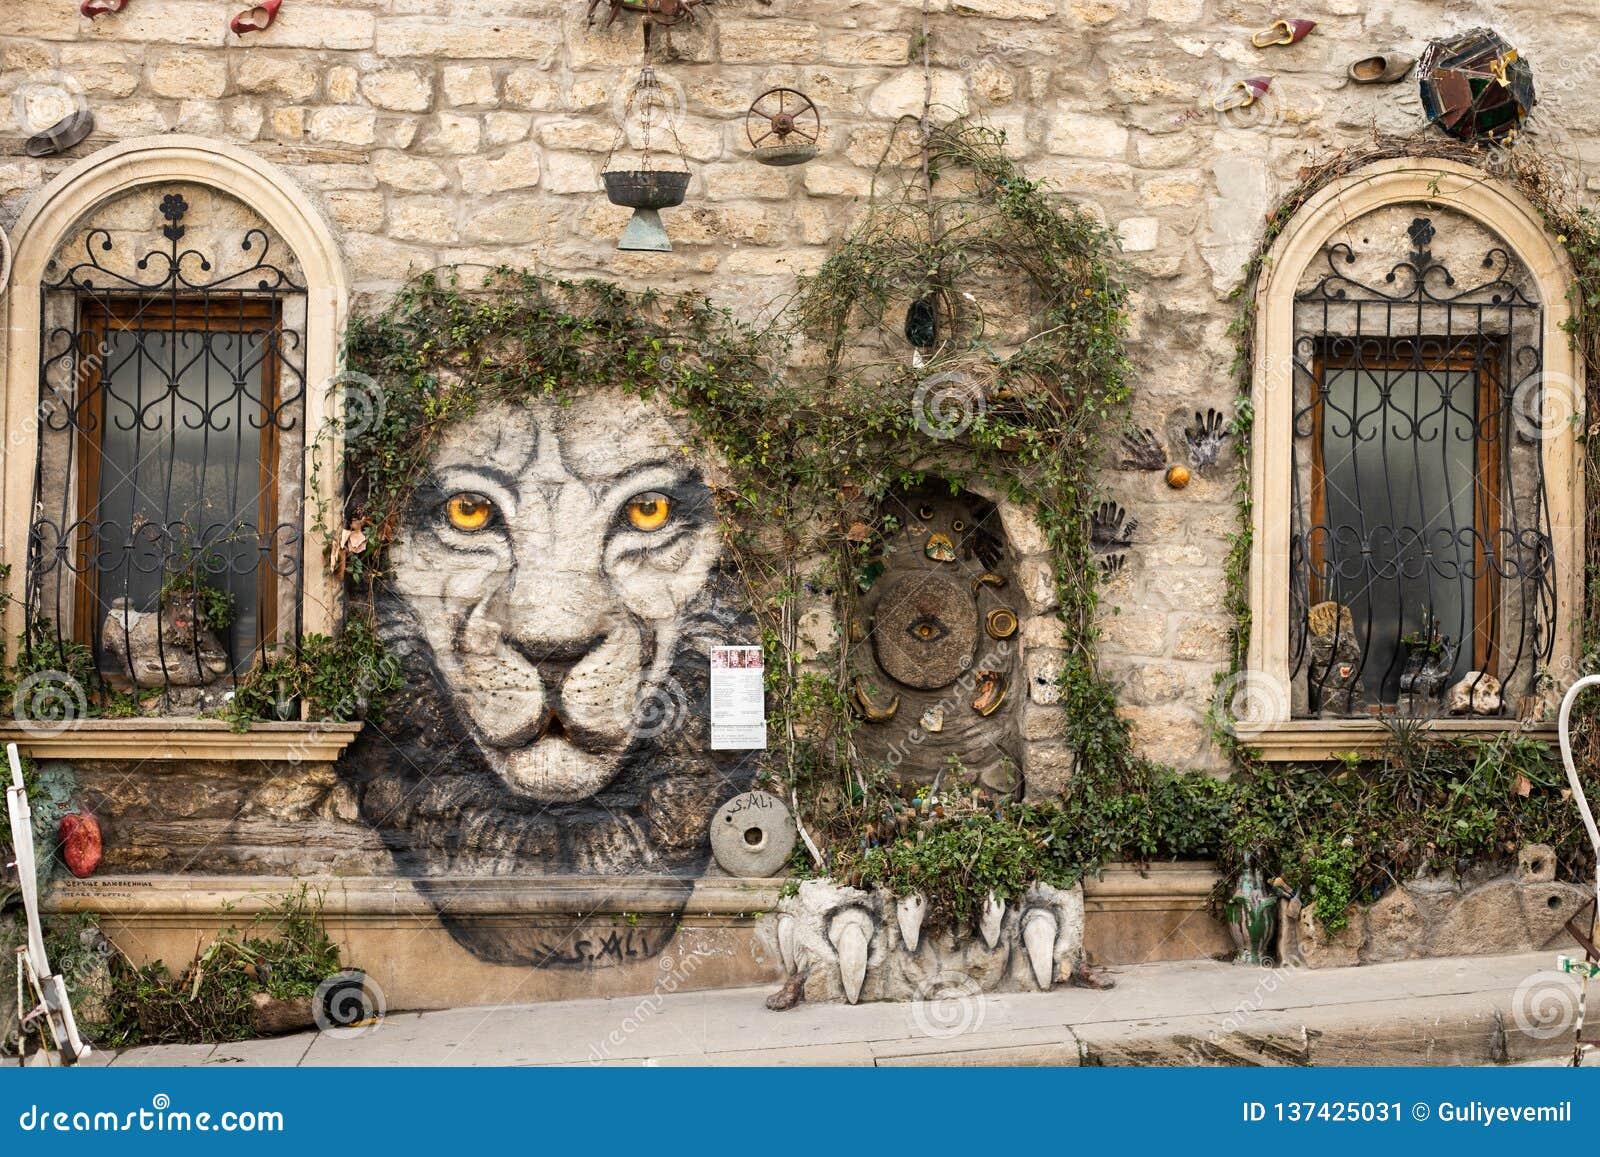 Baku azerbaijan old city. street art wall plant tree decoration. tiger face picture